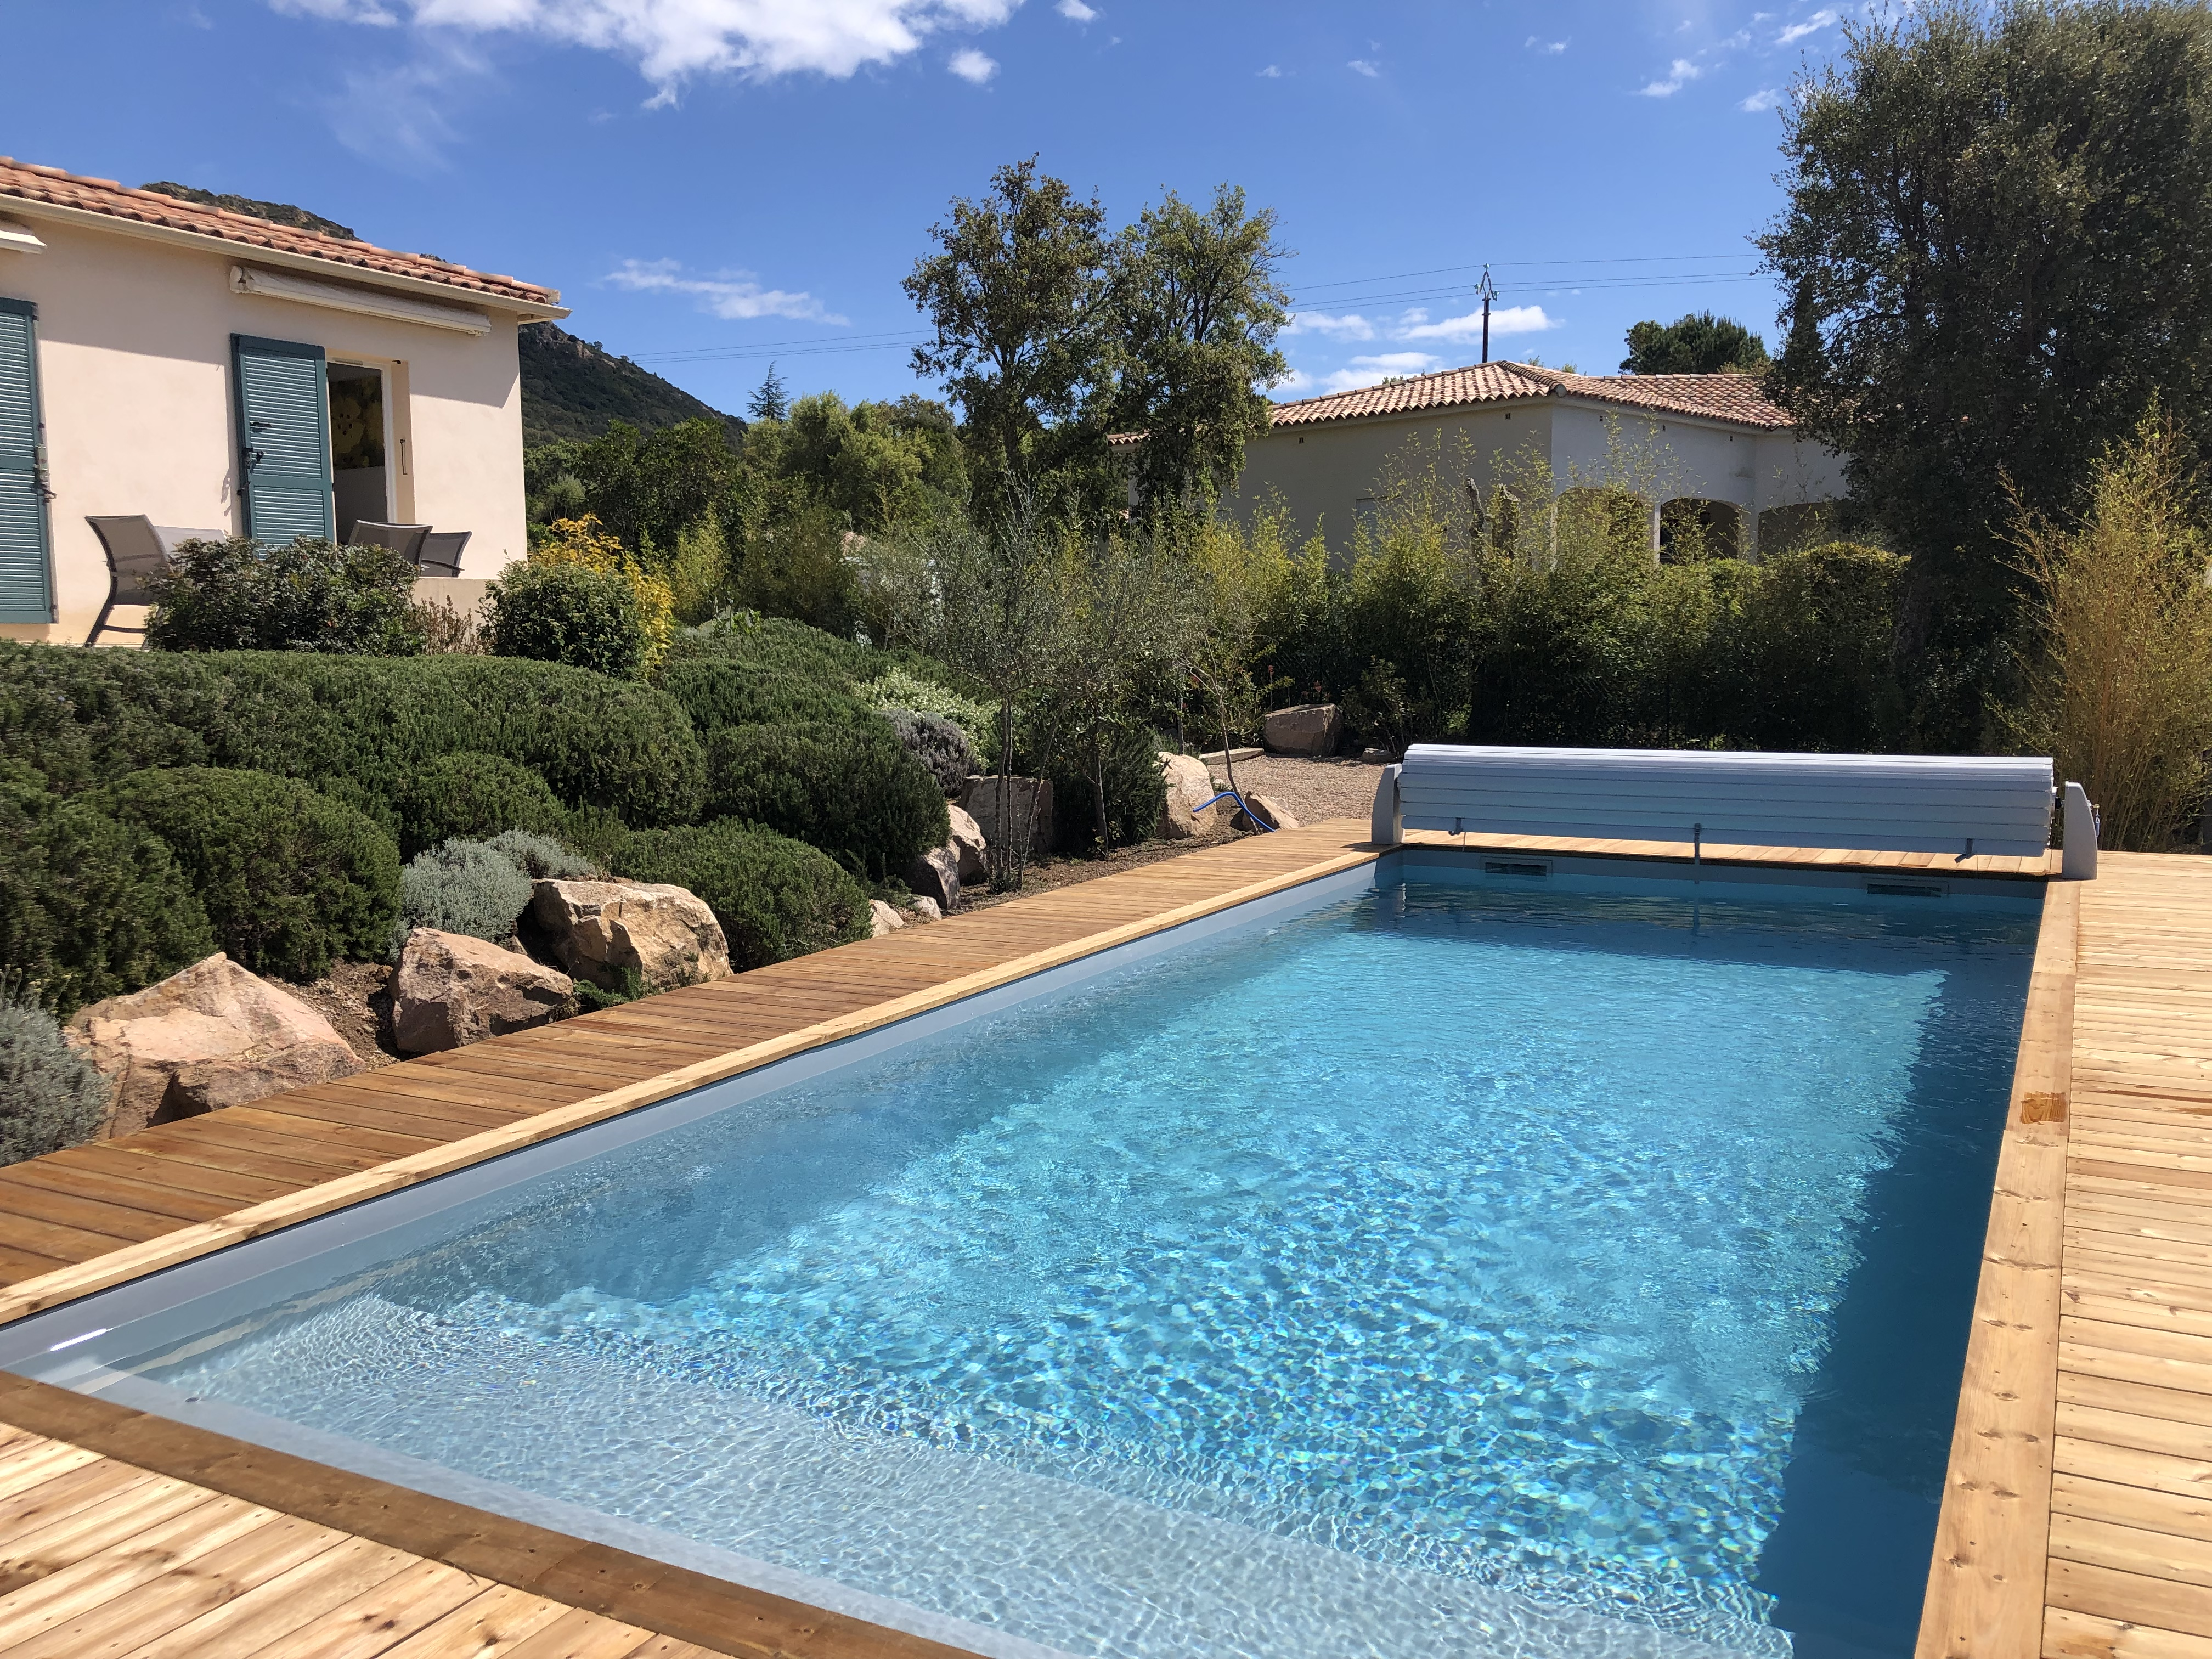 Corse locatios maisons de vacances